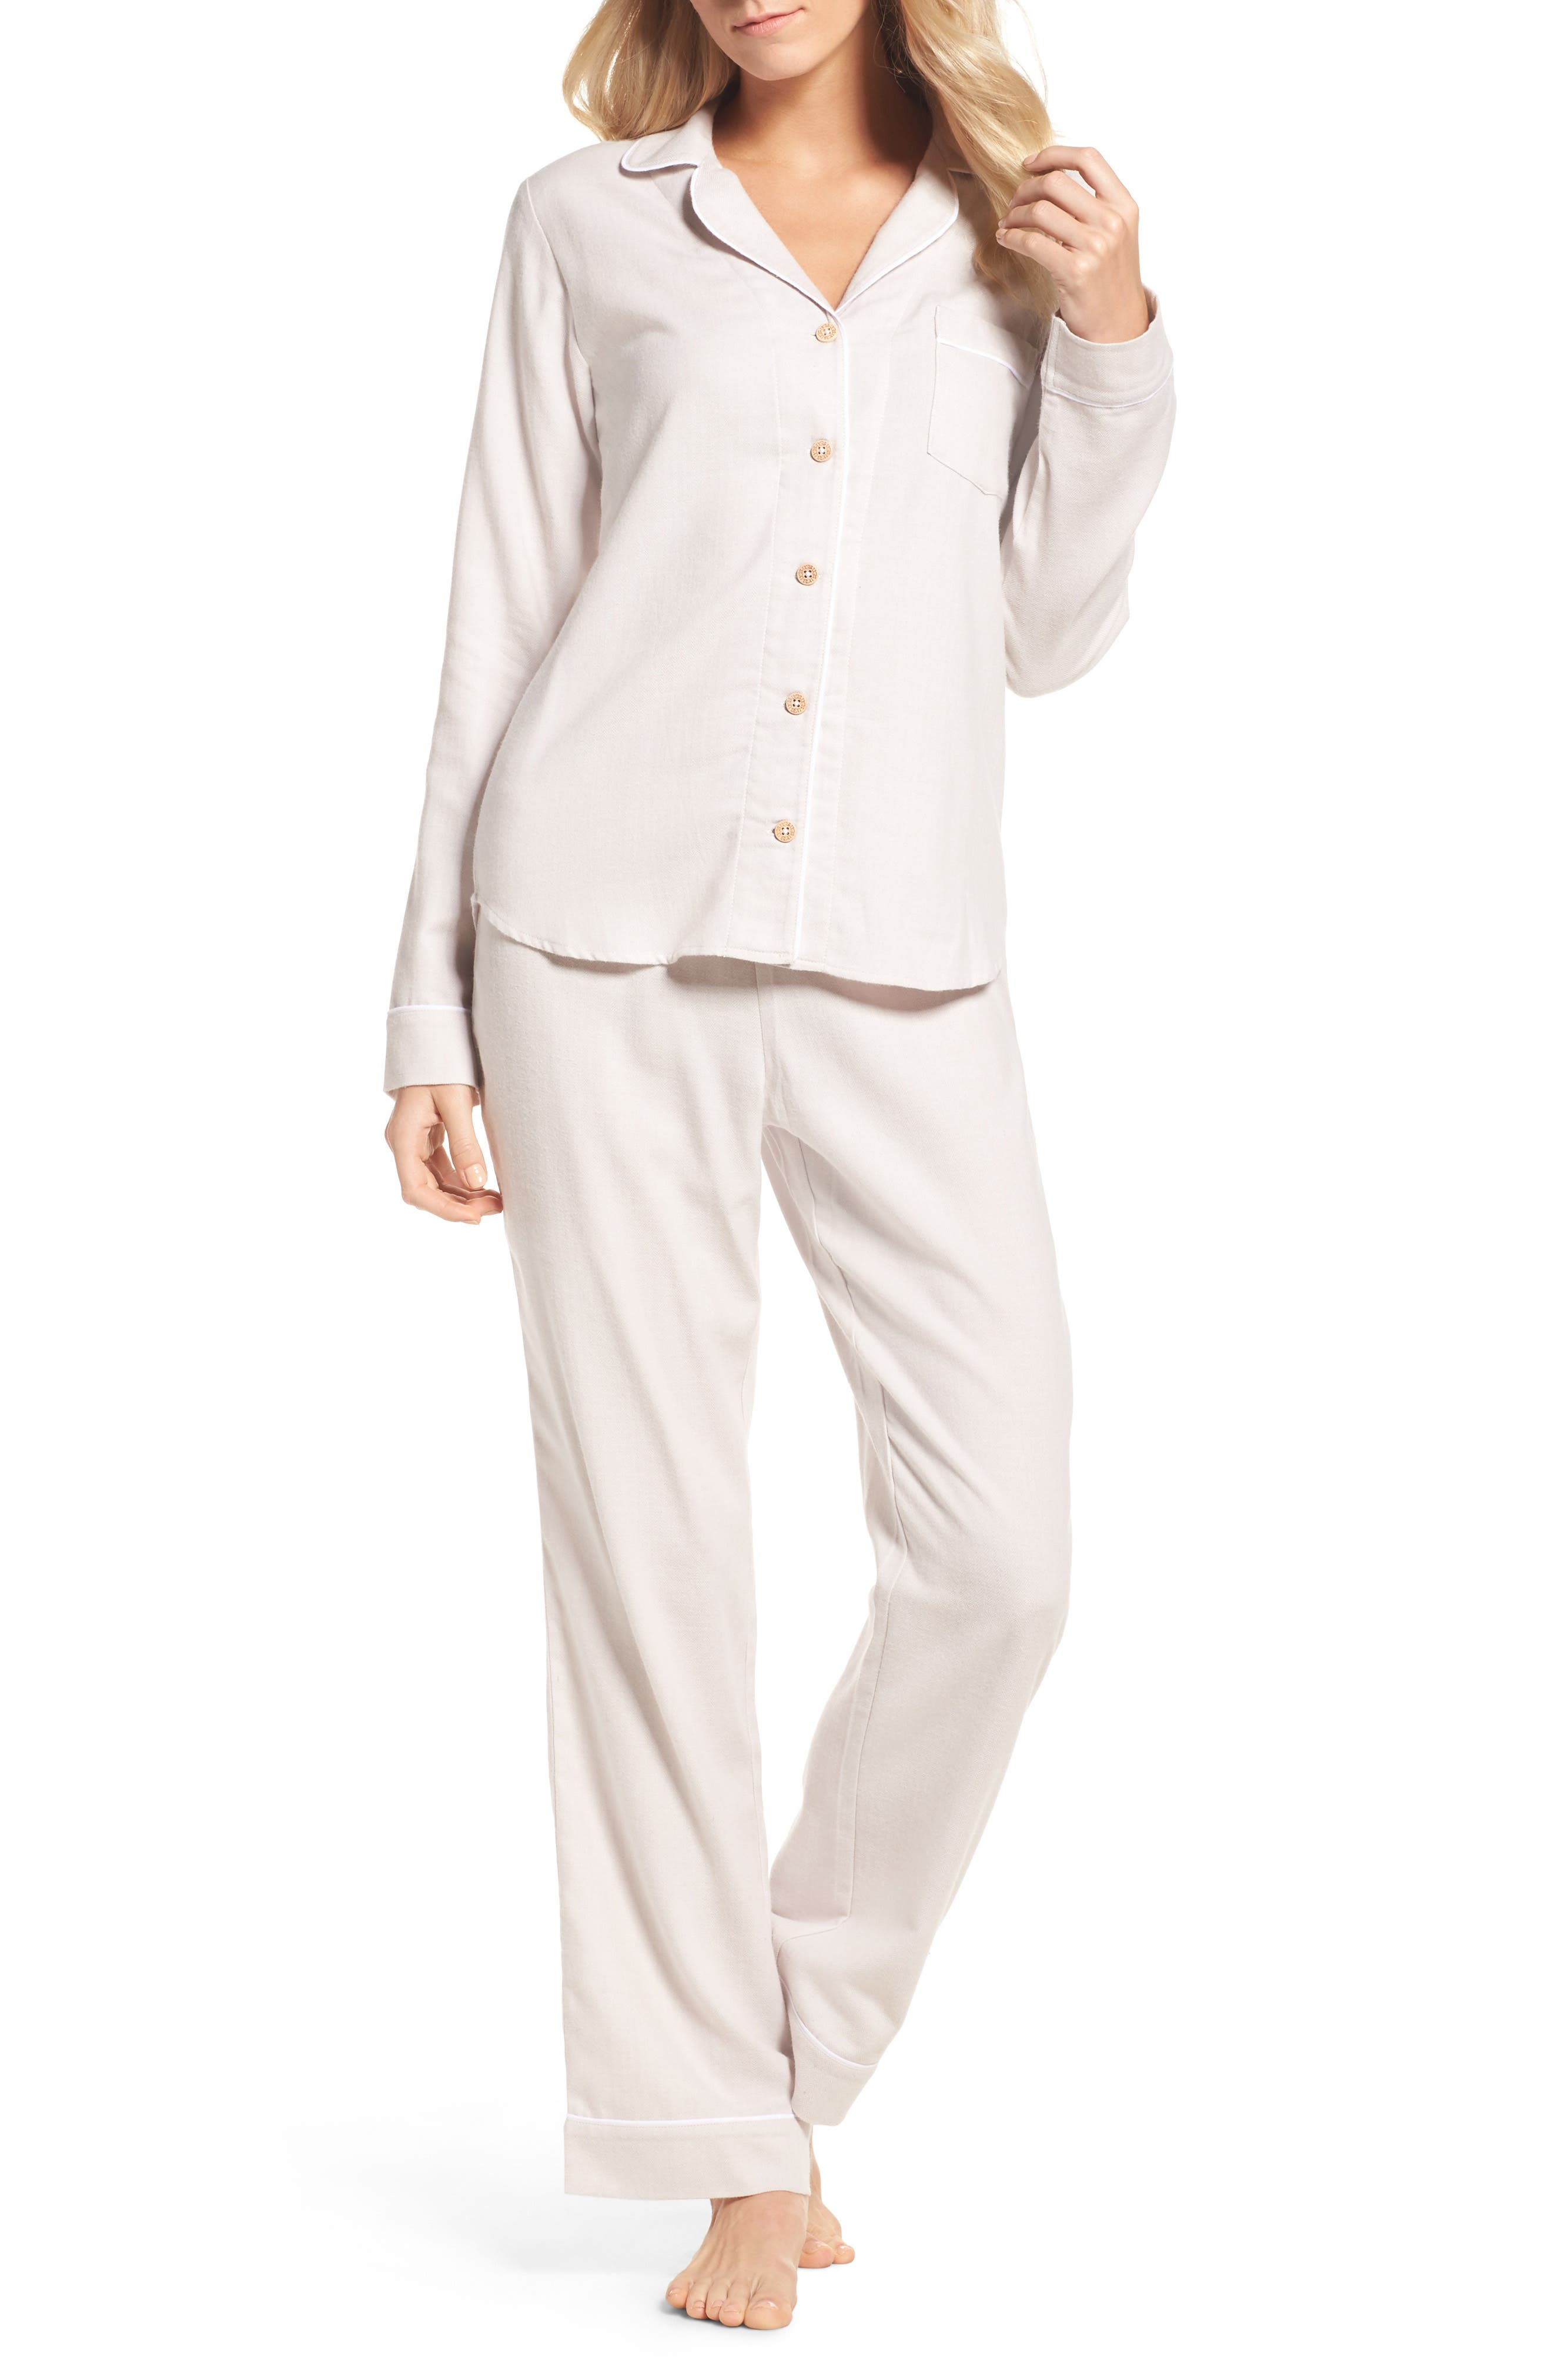 Raven Herringbone Pajamas,                         Main,                         color, Ivory